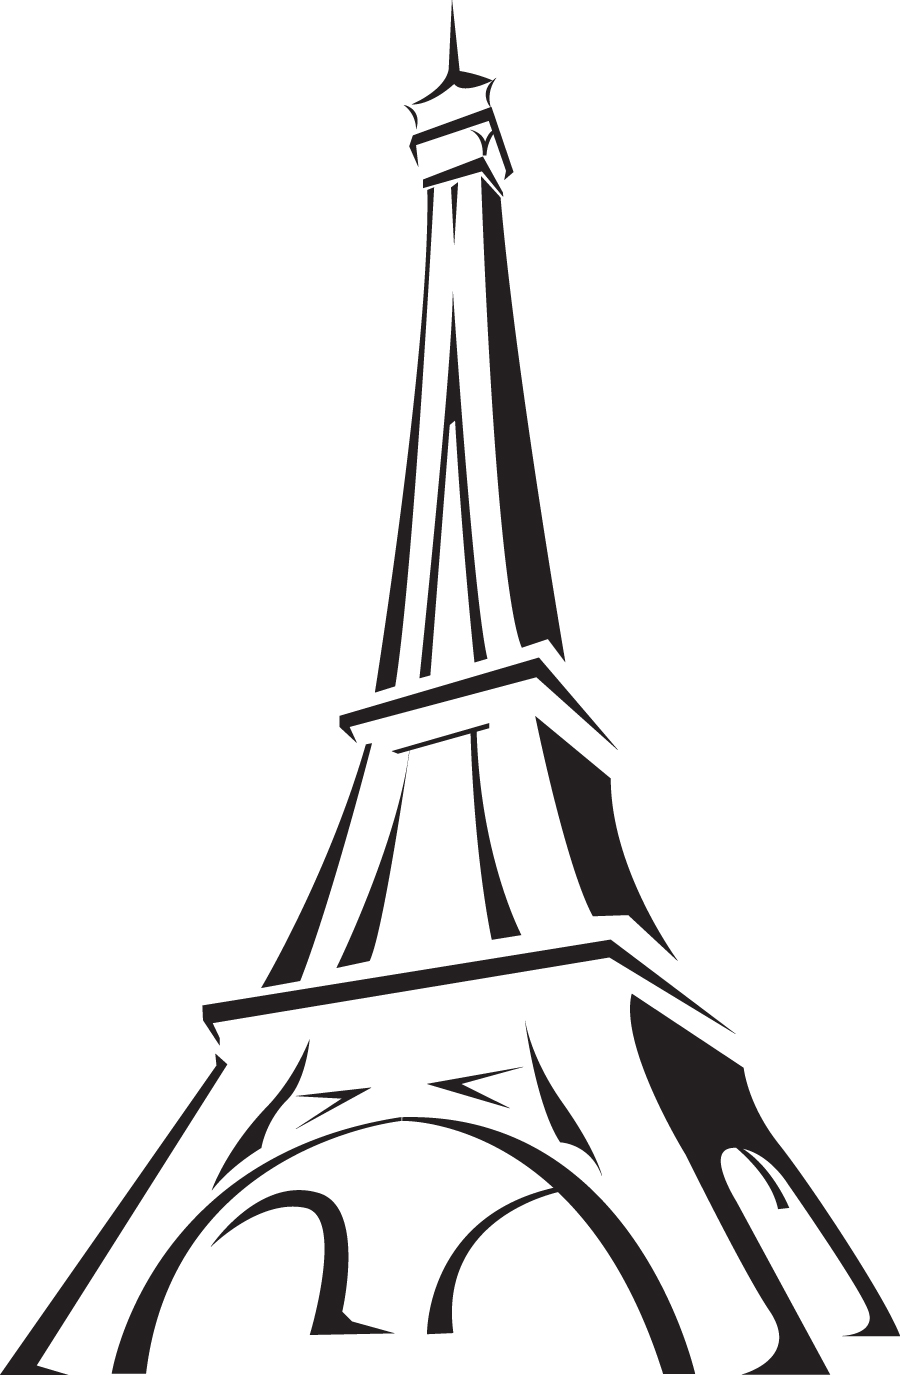 Torre eiffel dibujo clipart clipart free stock Free Torre Eiffel Vector, Download Free Clip Art, Free Clip ... clipart free stock